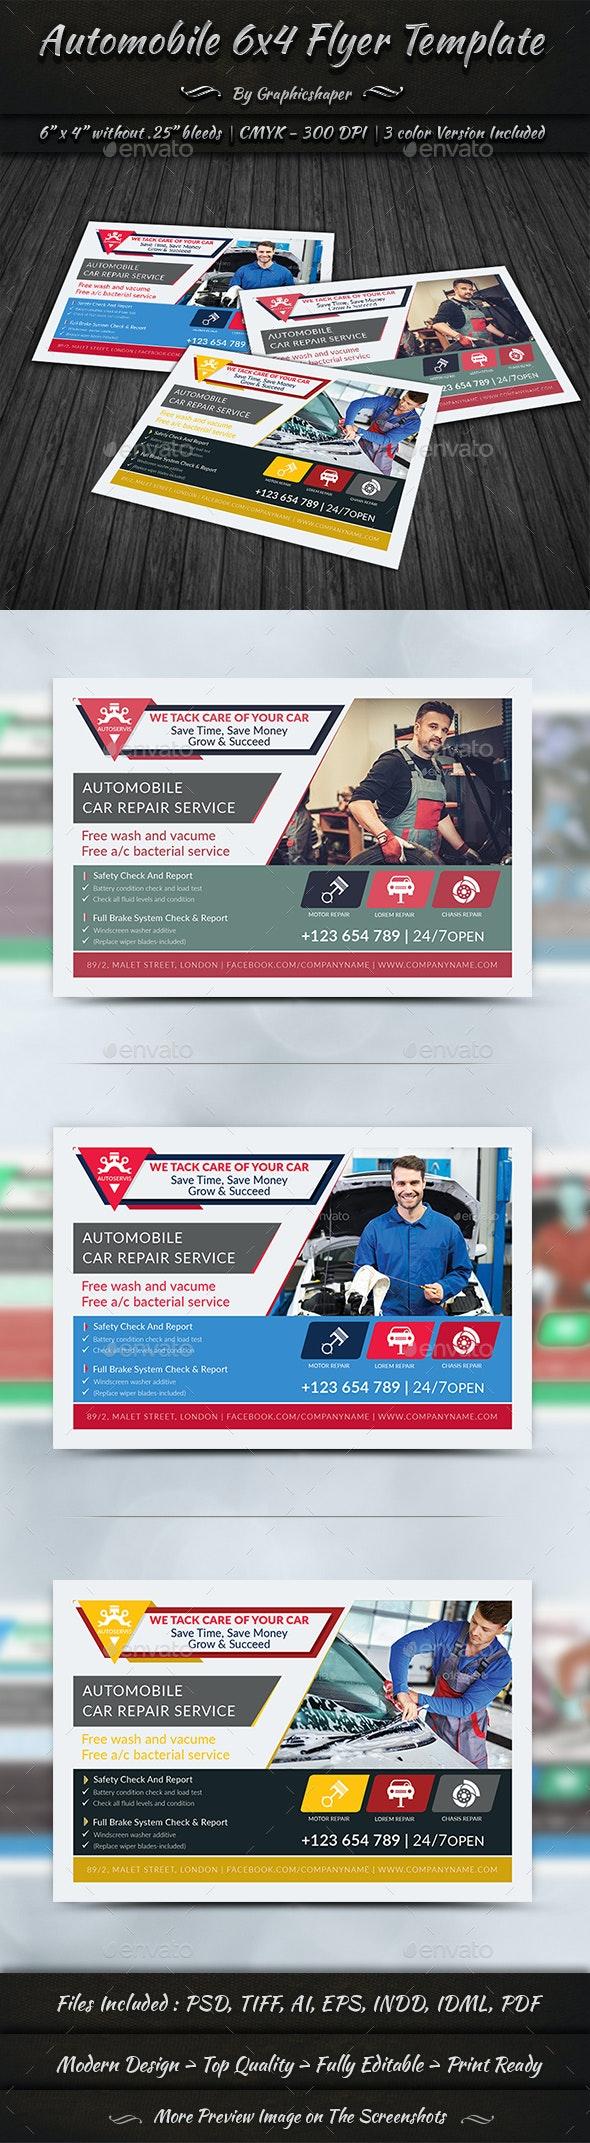 Automobile 6x4 Flyer Template - Flyers Print Templates